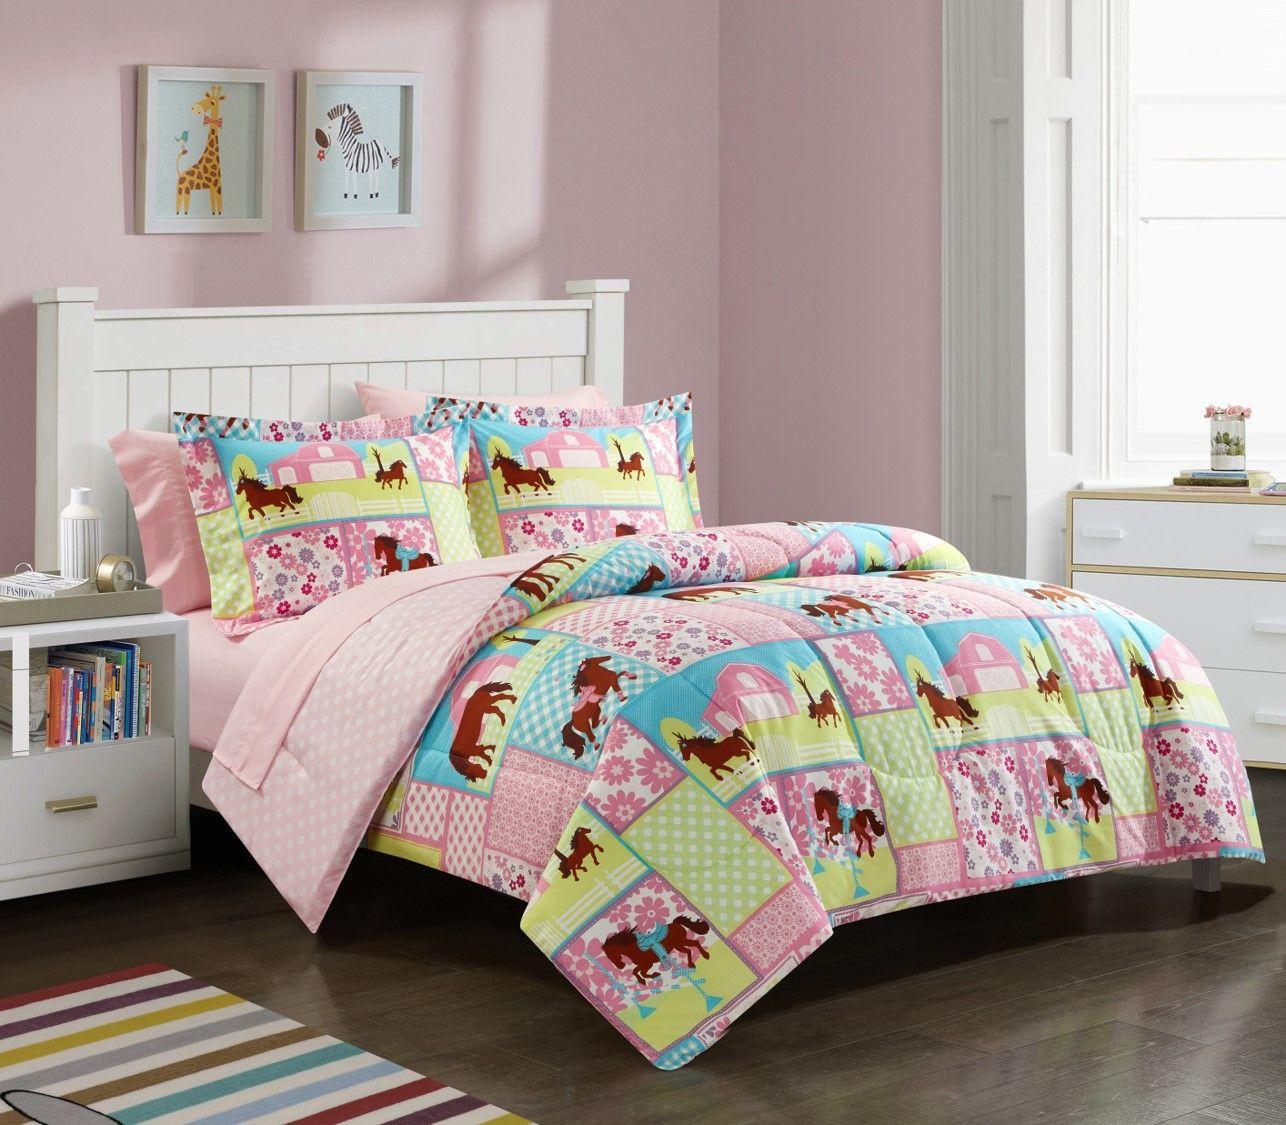 Home In 2020 Kids Bedding Sets Bed In A Bag Bedding Set